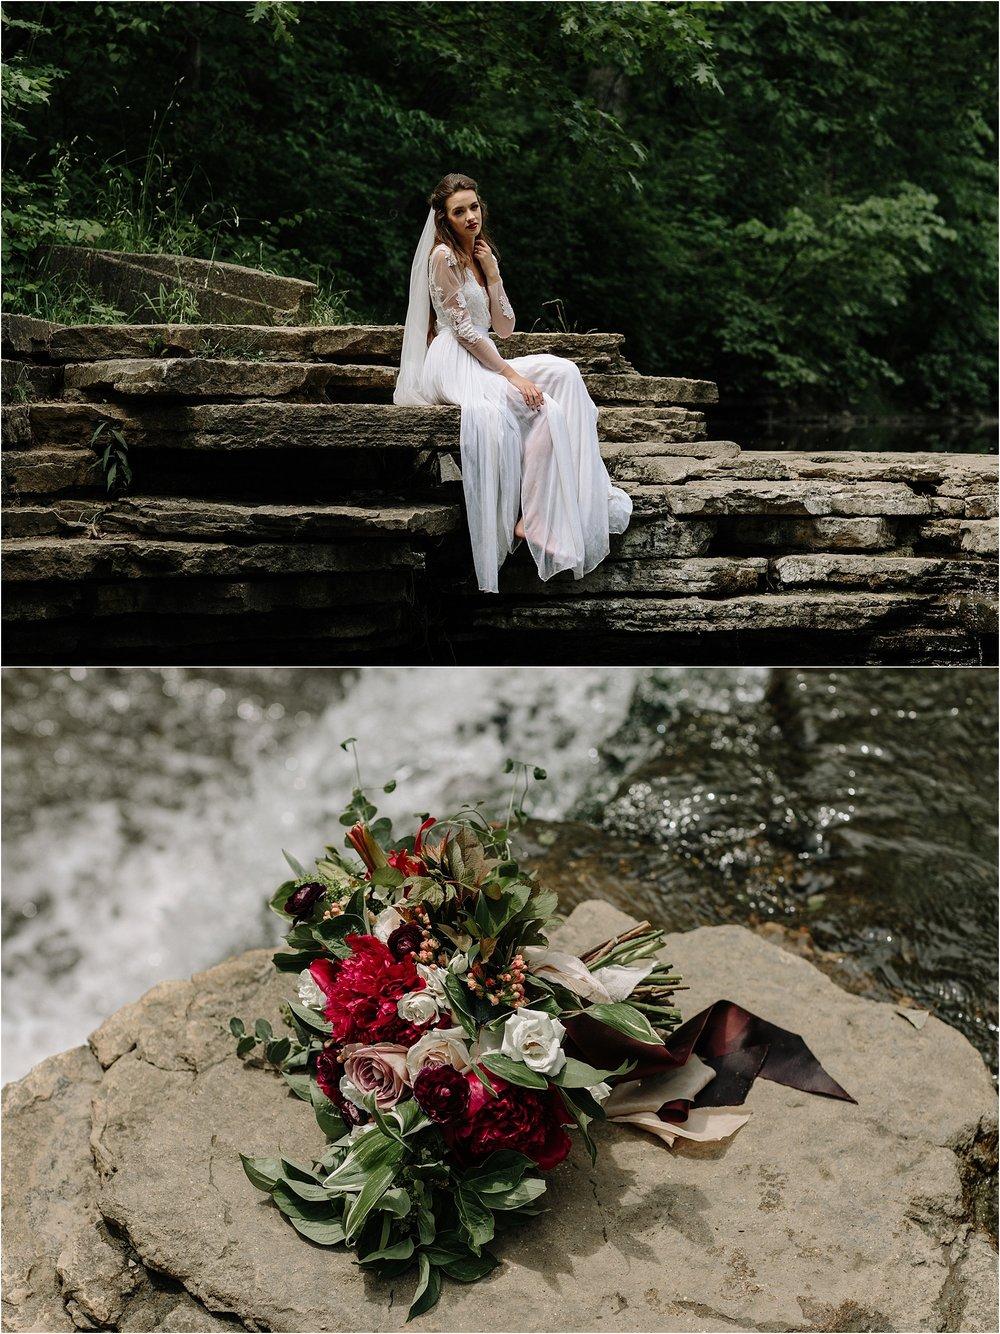 waterfall-glen-wedding-lemont-il-23.jpg